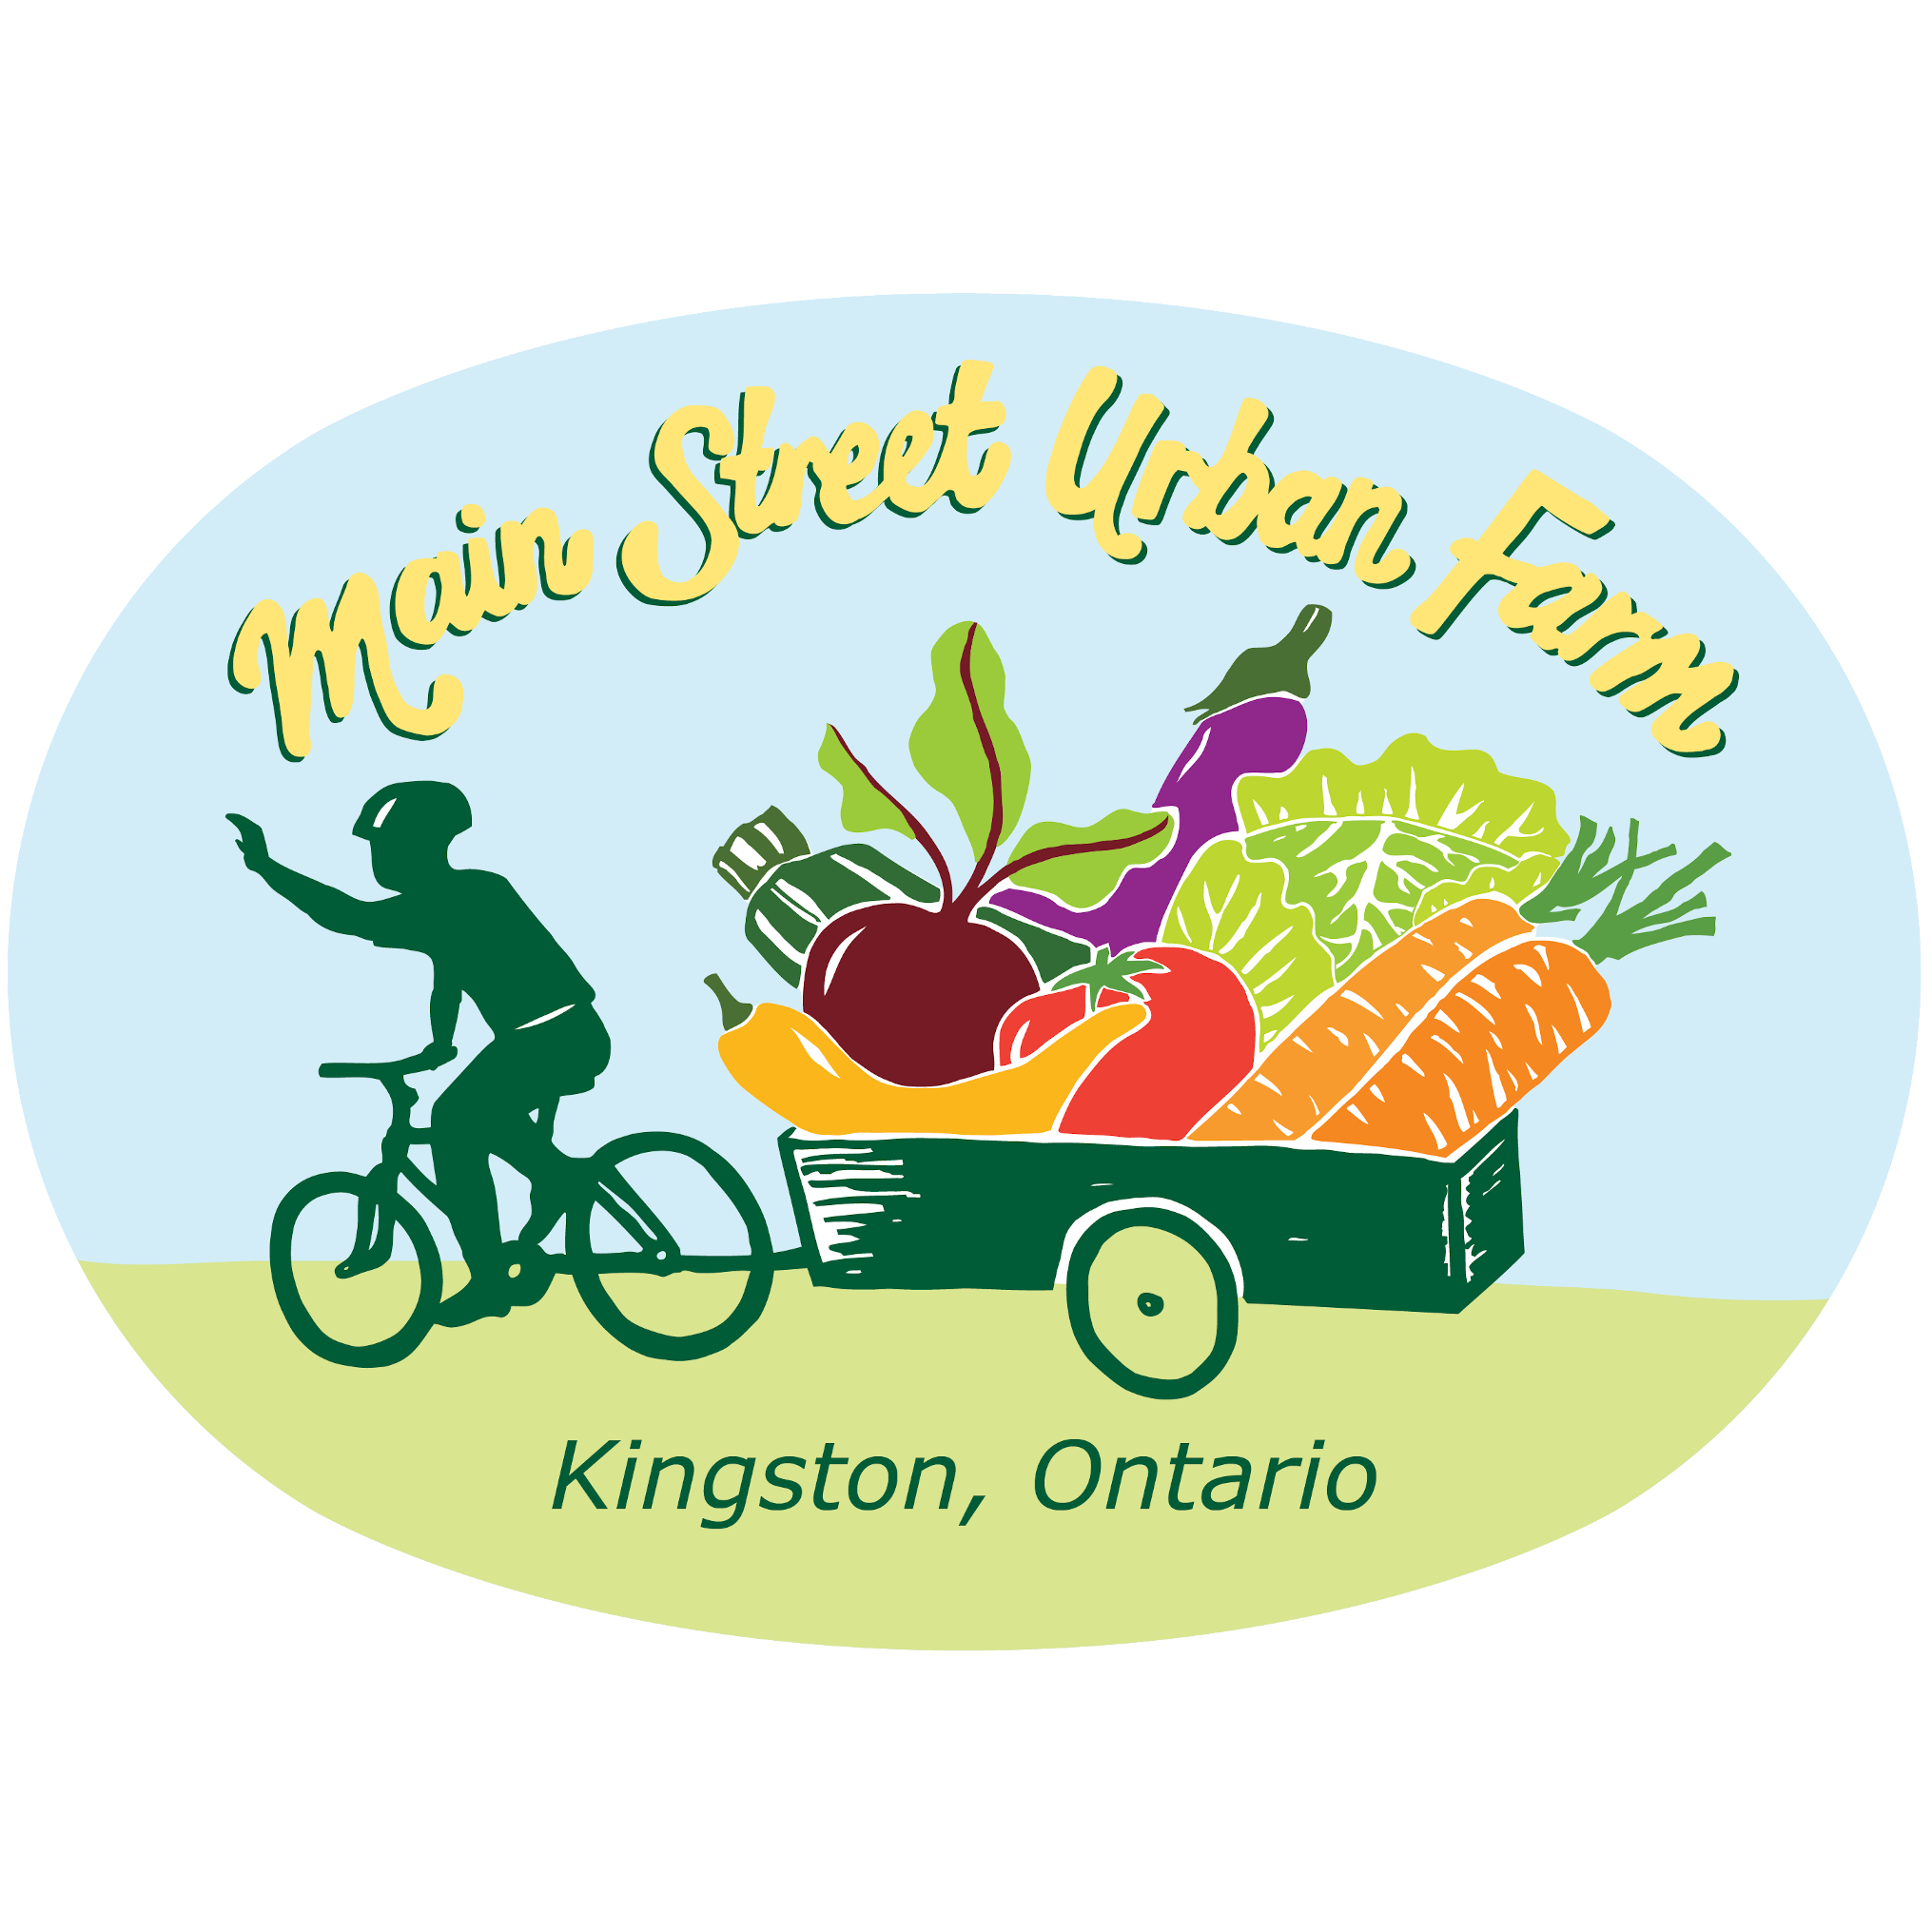 Main Street Urban Farm